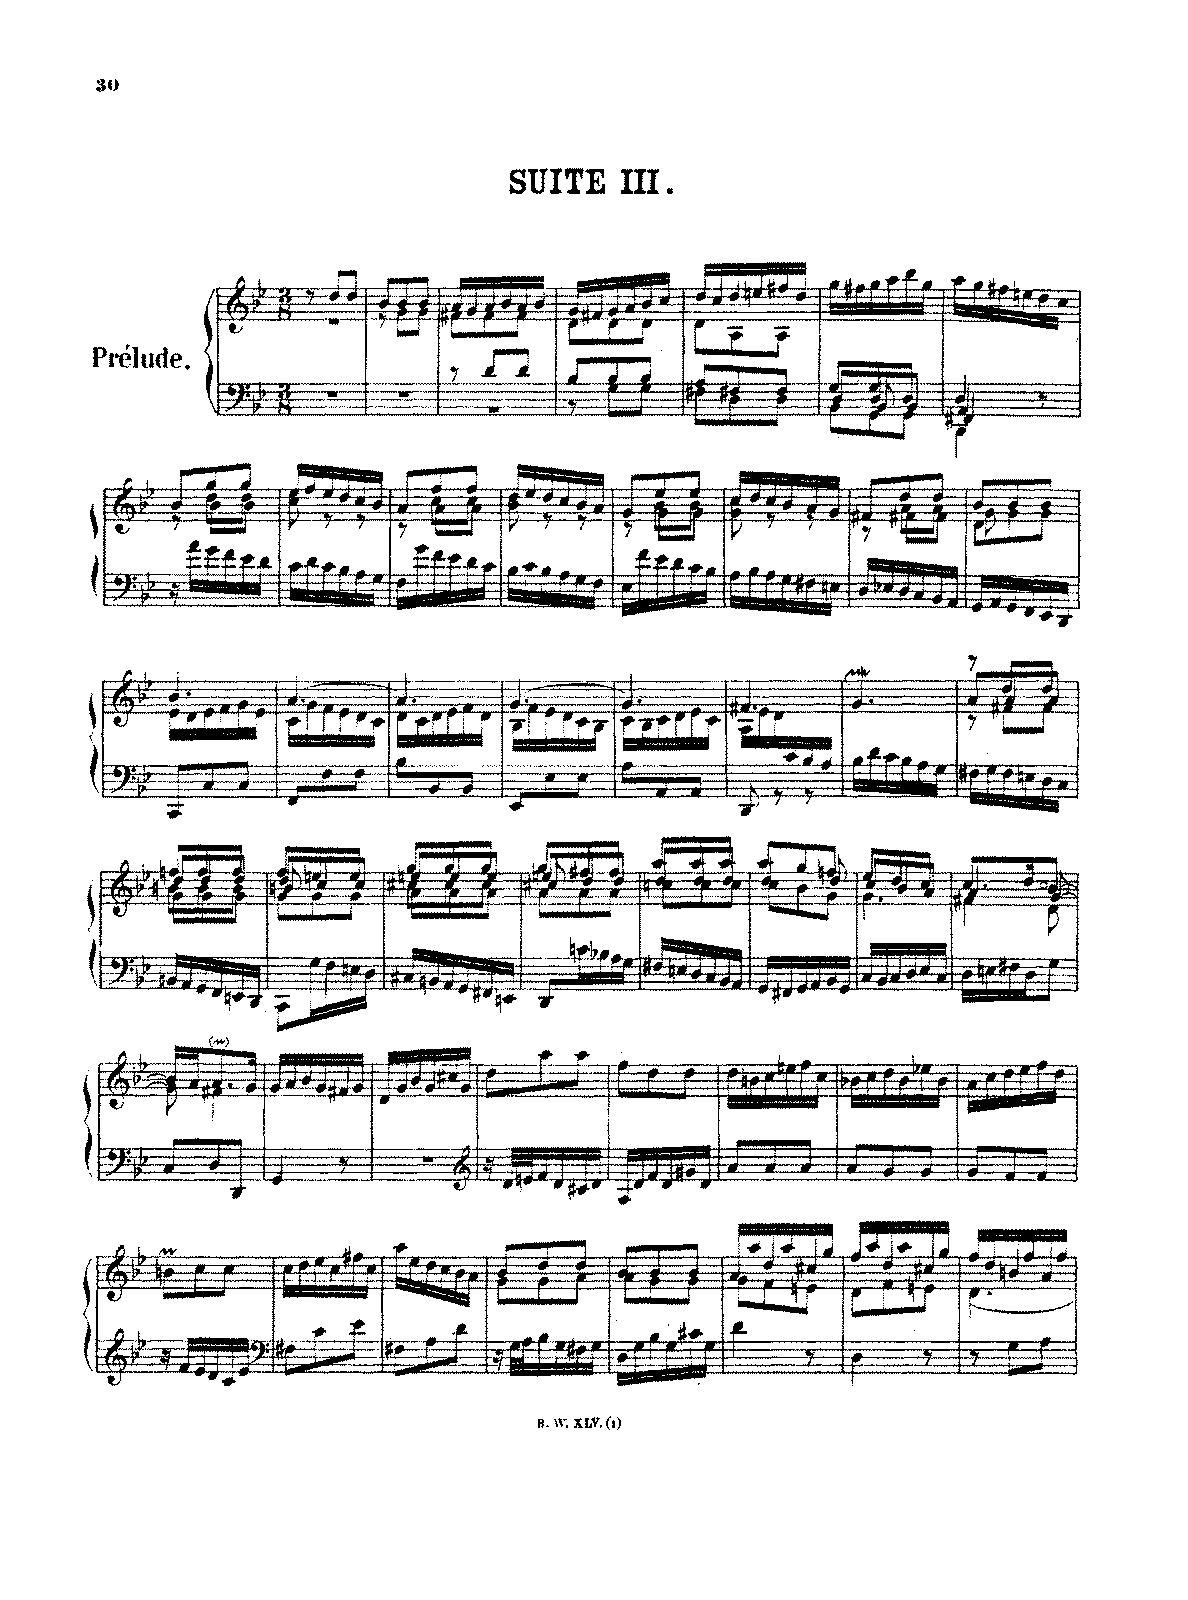 johann sebastian bach pdf prulude no 1 in c major